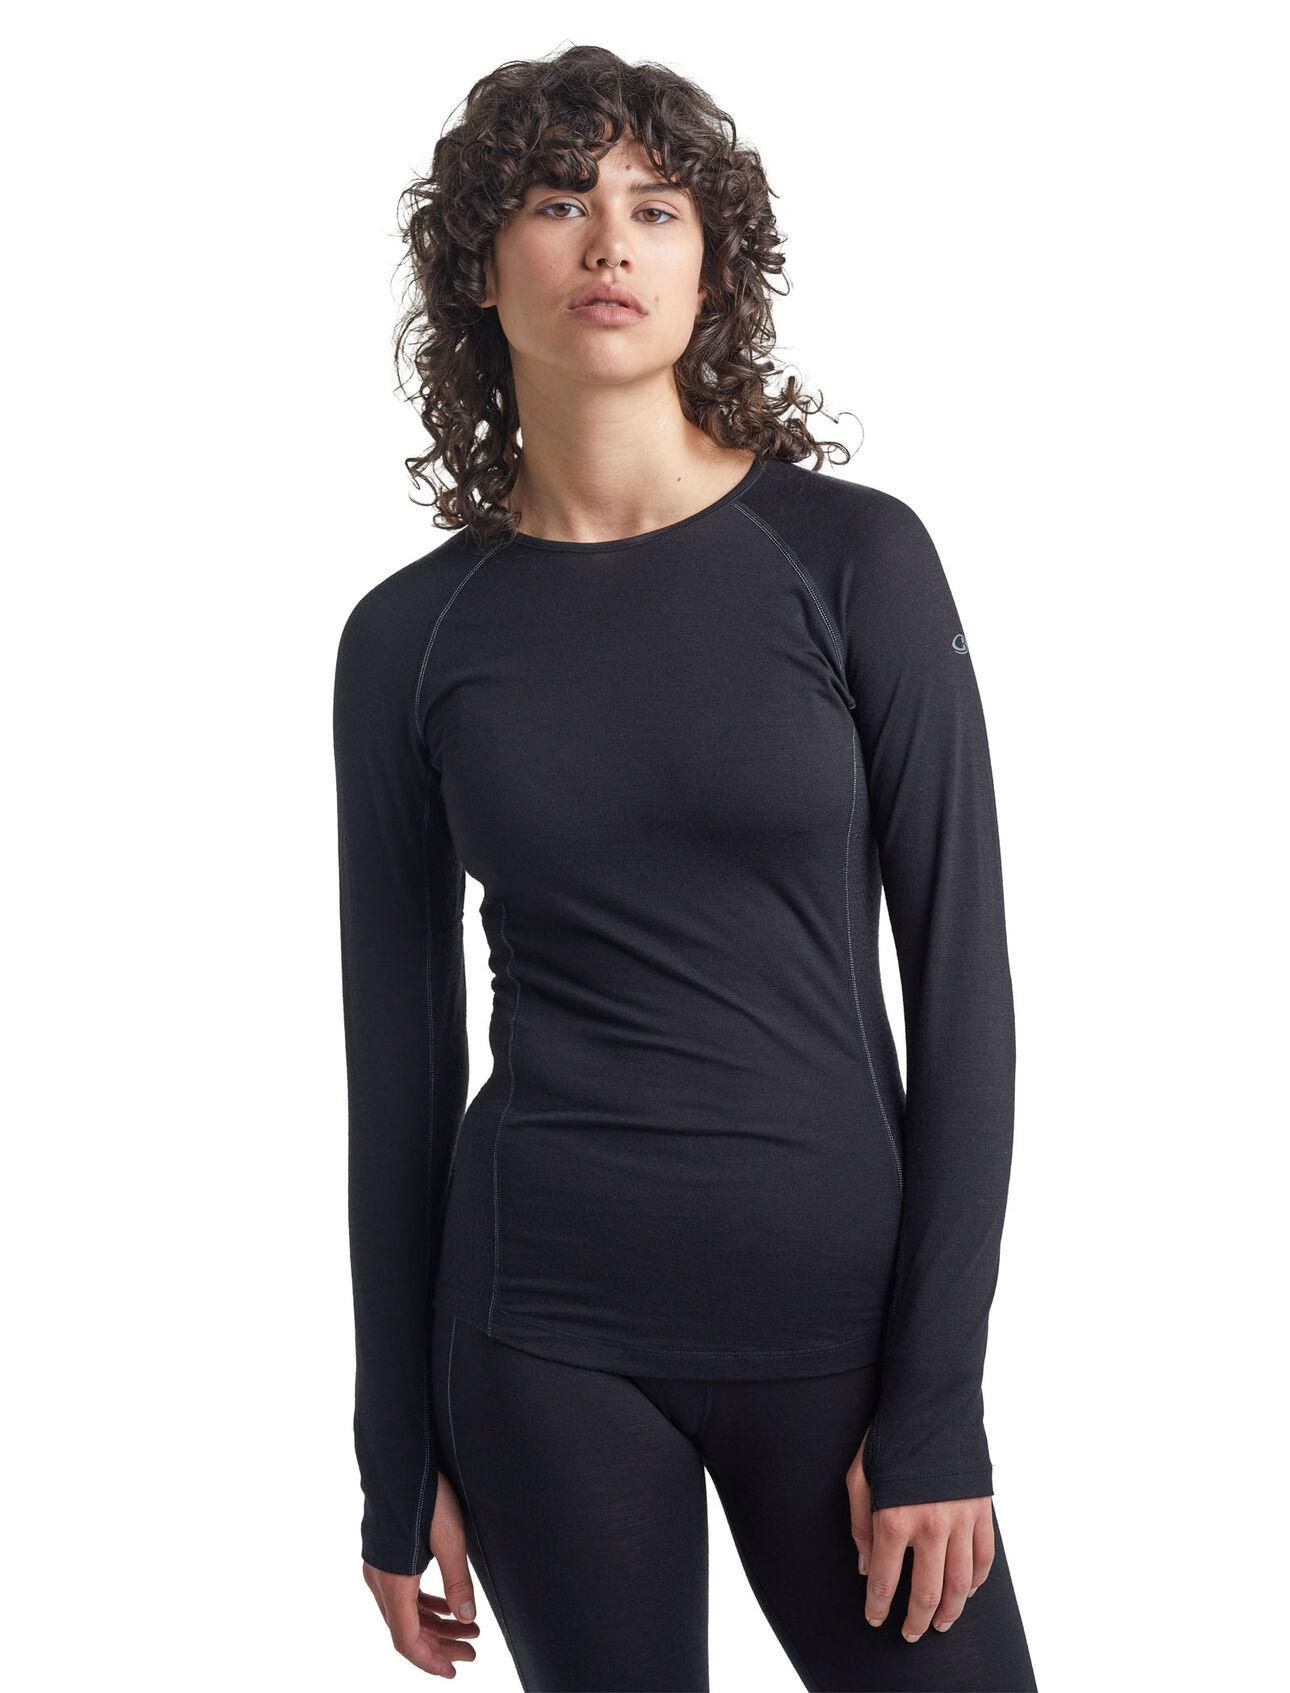 BodyFitZone™ 150 Zone长袖圆领上衣